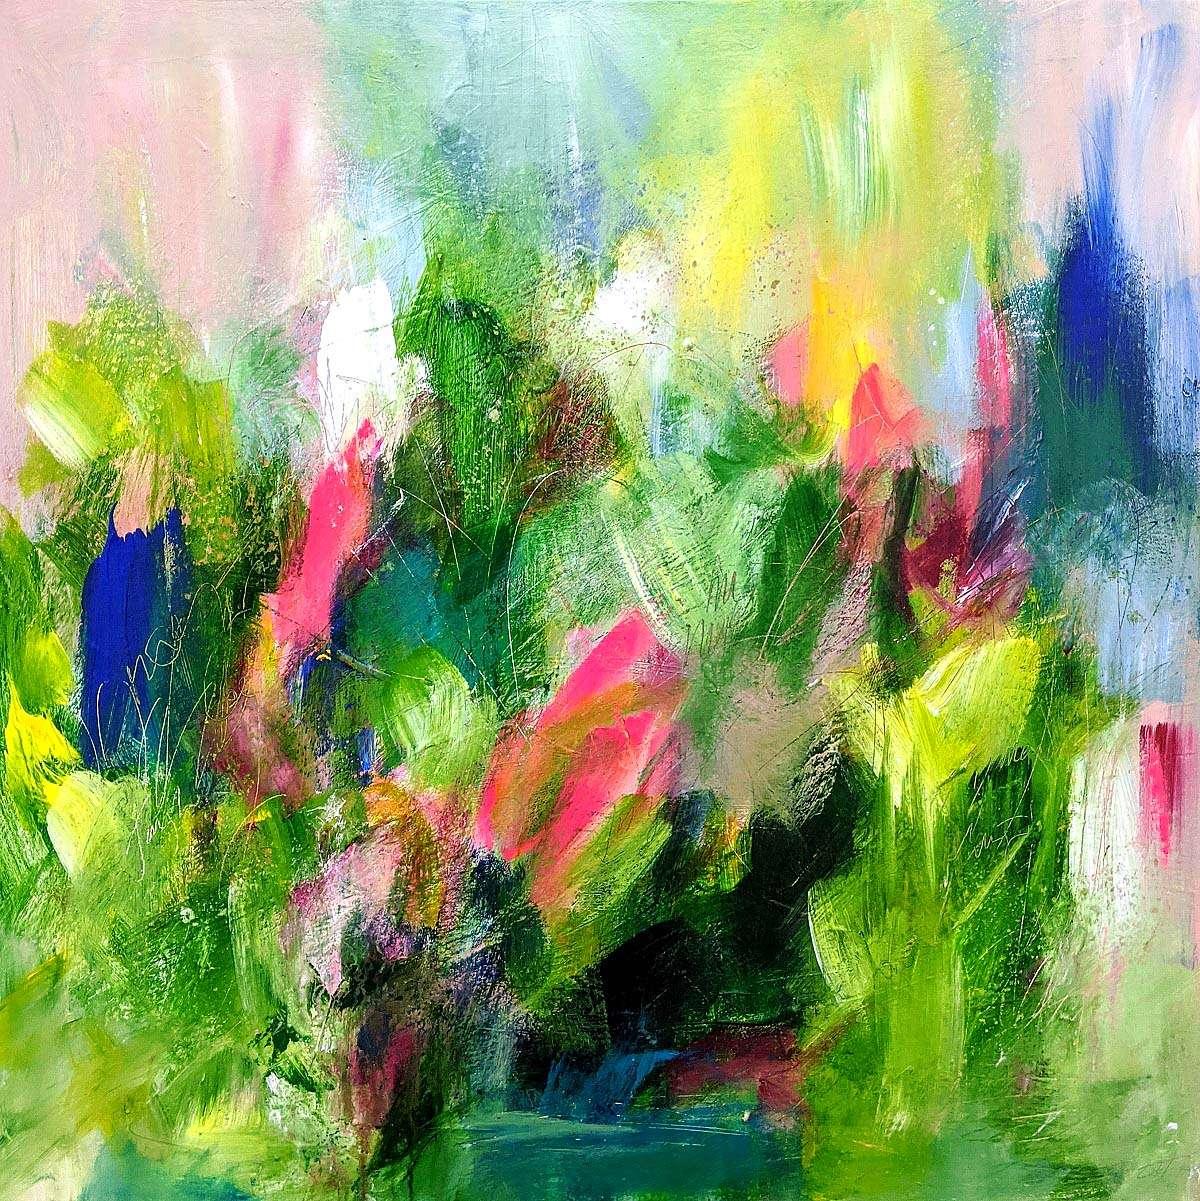 Shona Harcus, 'Jungling', acrylic on canvas